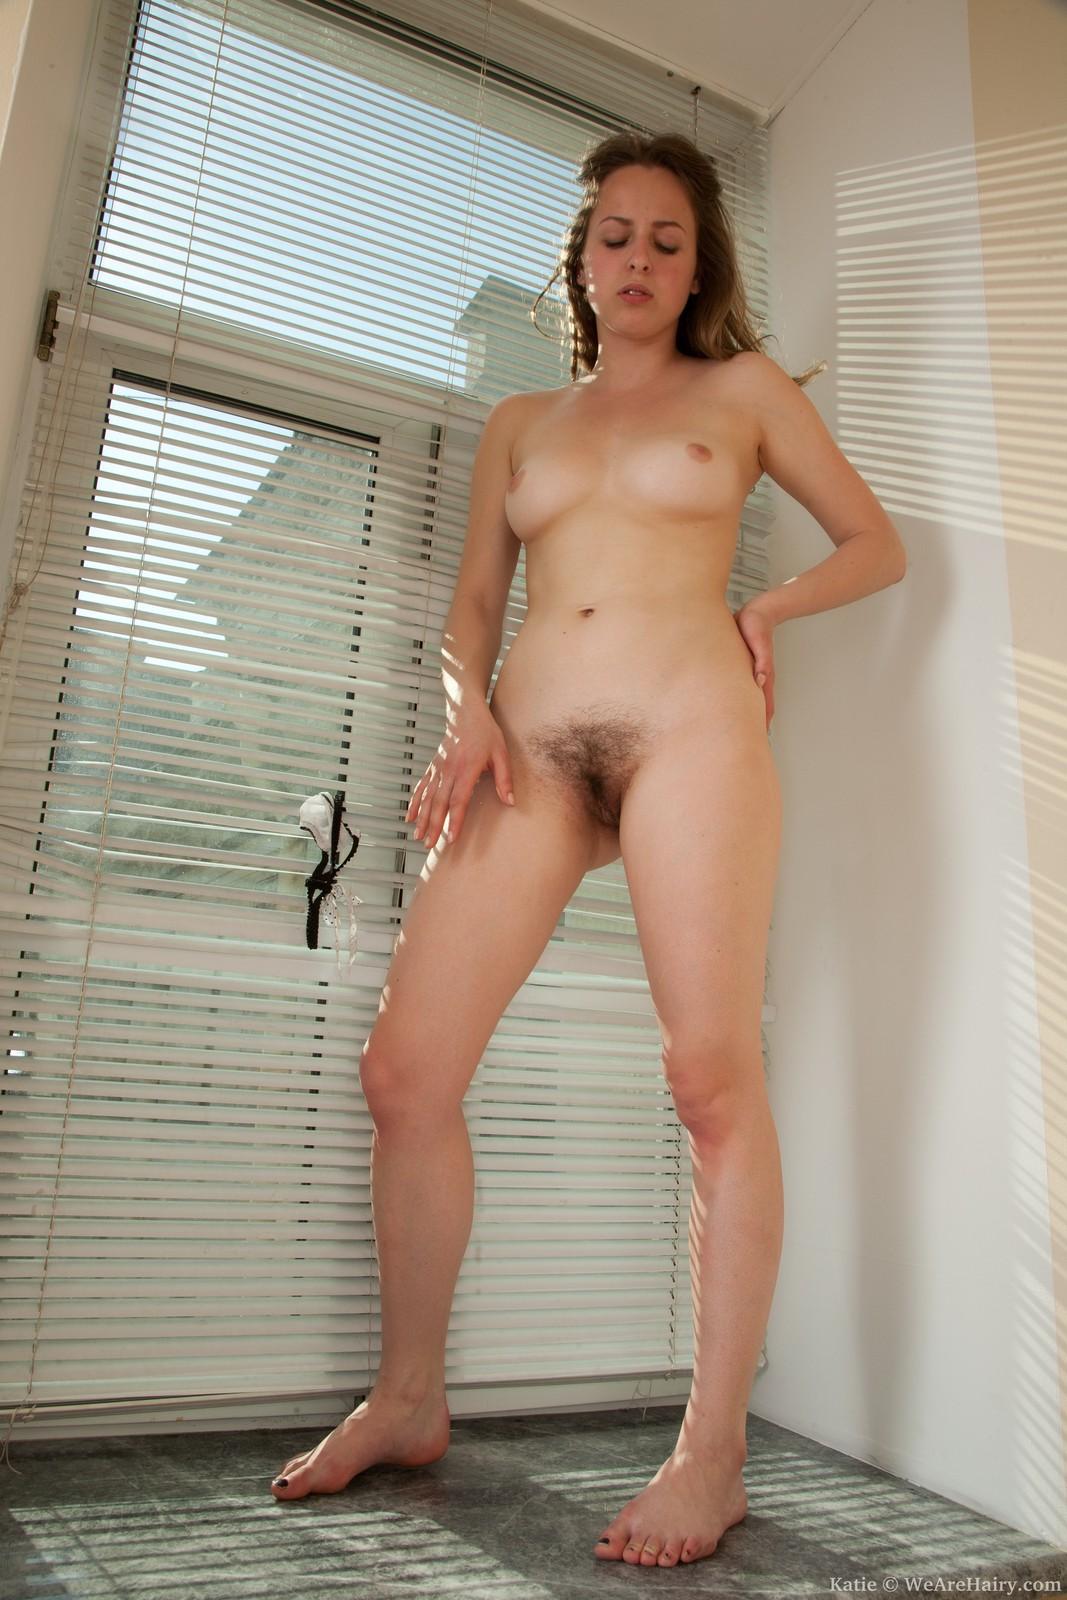 alice in wonderland fake porn